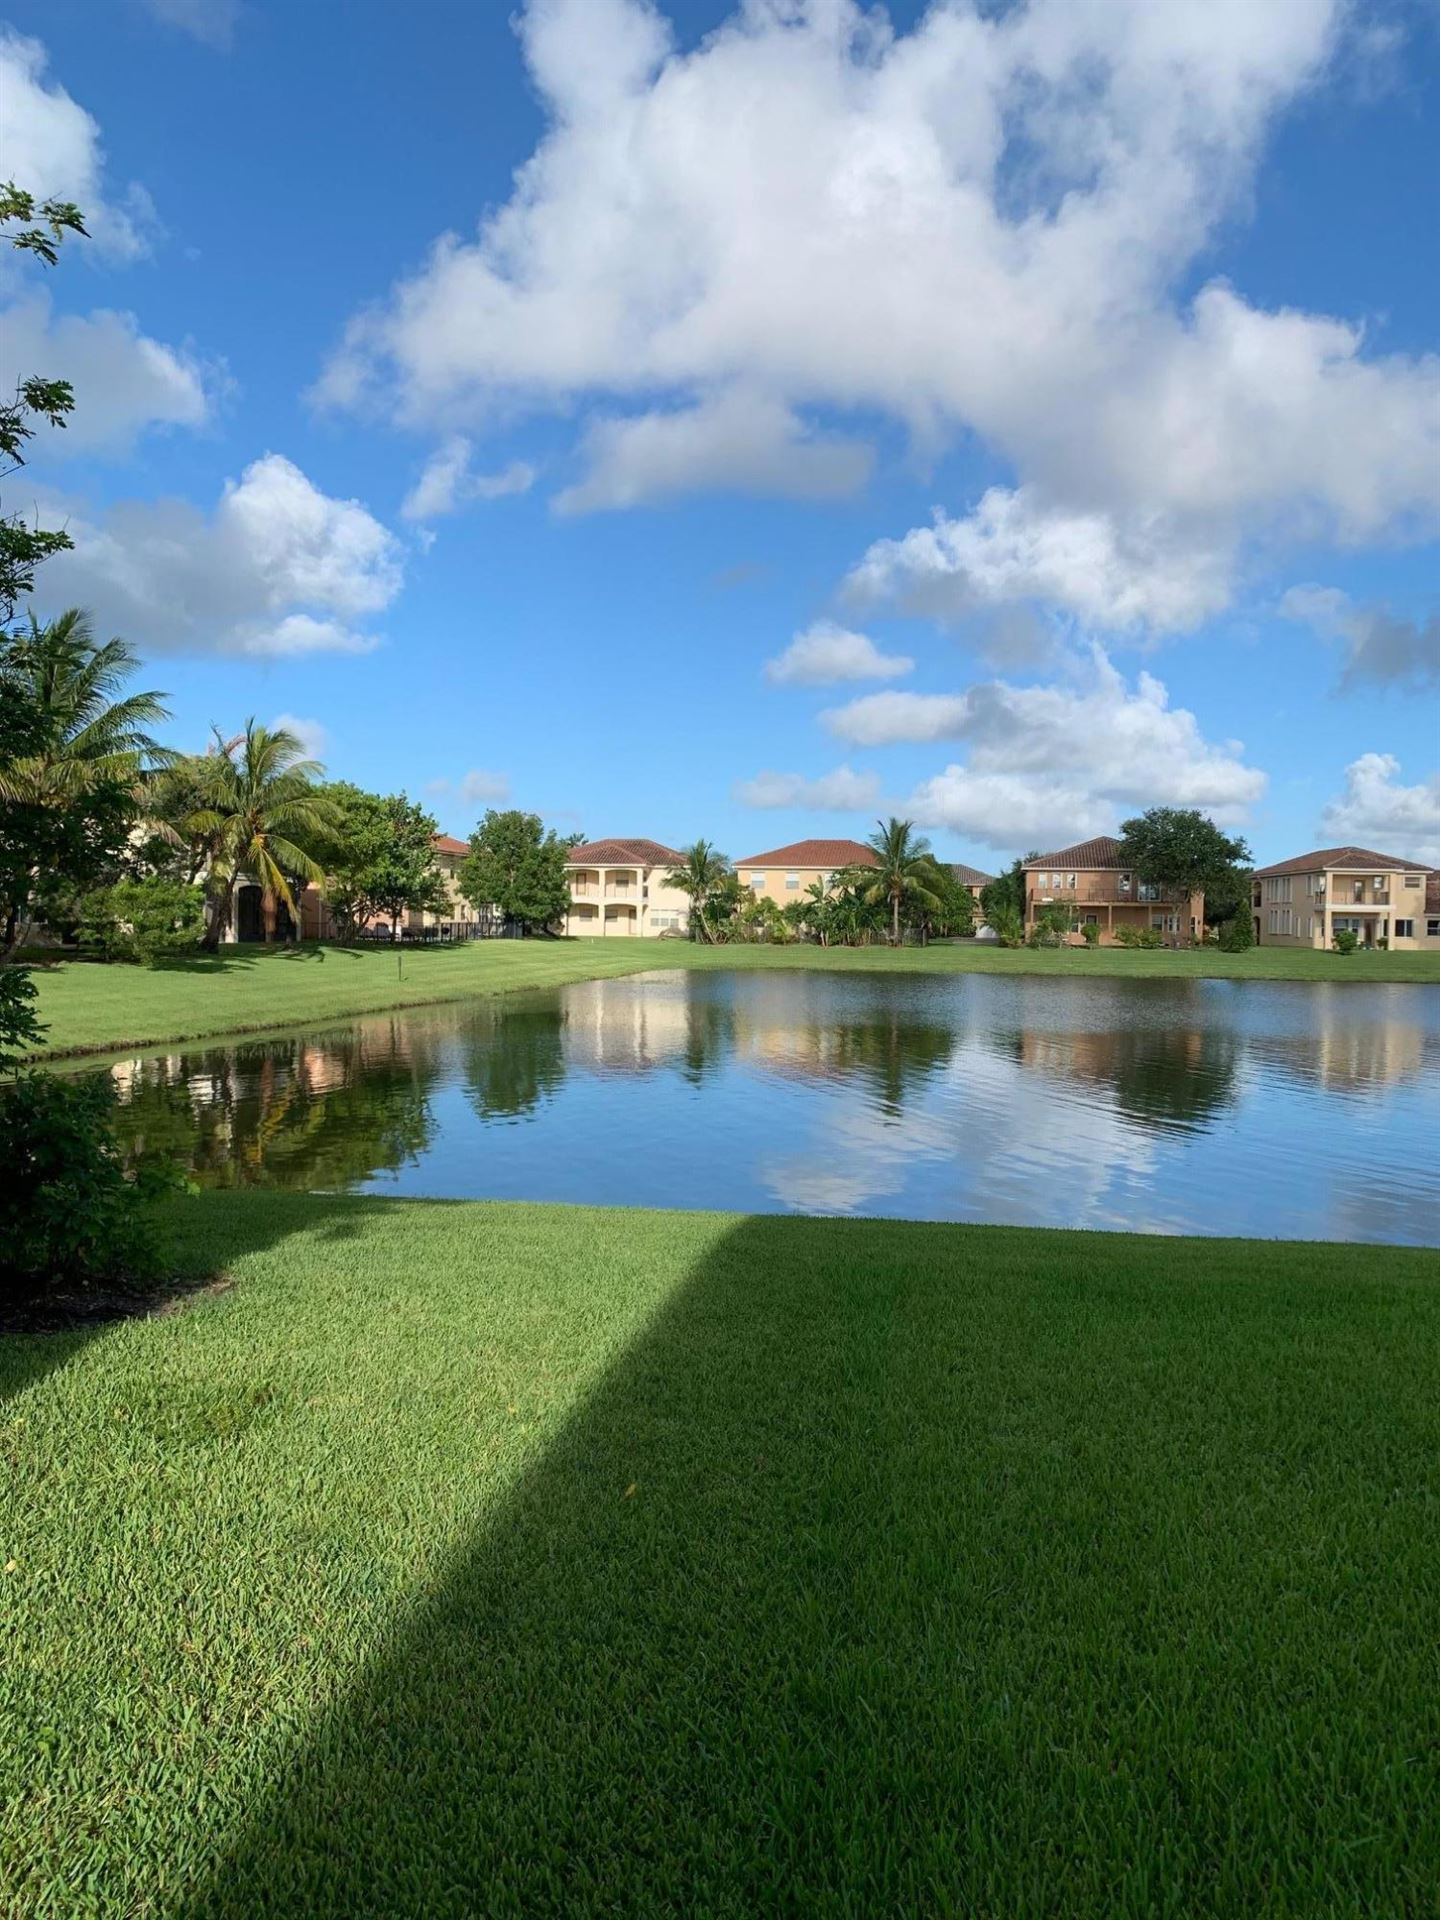 506 Cresta Circle, West Palm Beach, FL 33413 - #: RX-10640003